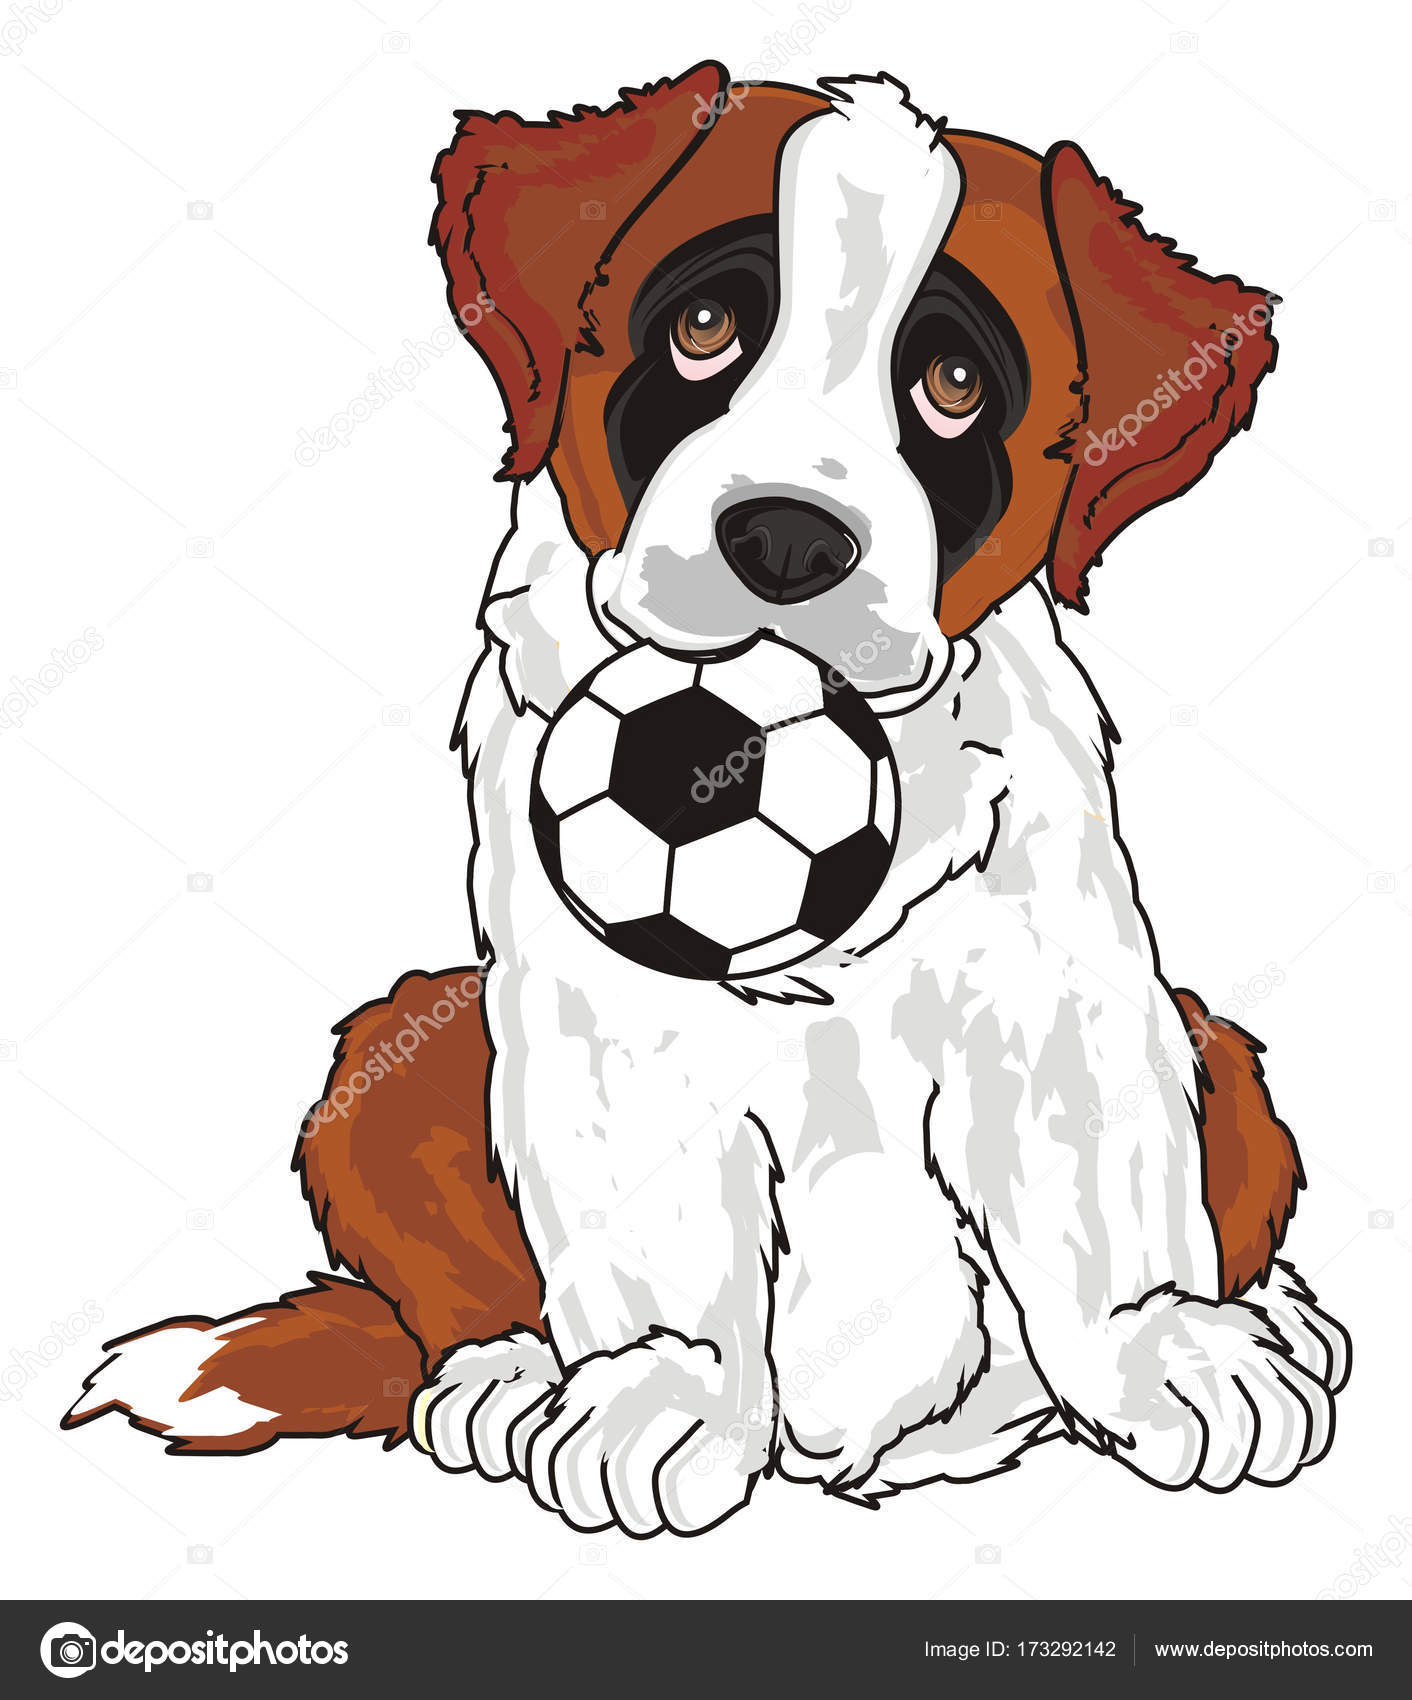 cachorro de San Bernardo — Foto de stock © tatty77tatty #173292142